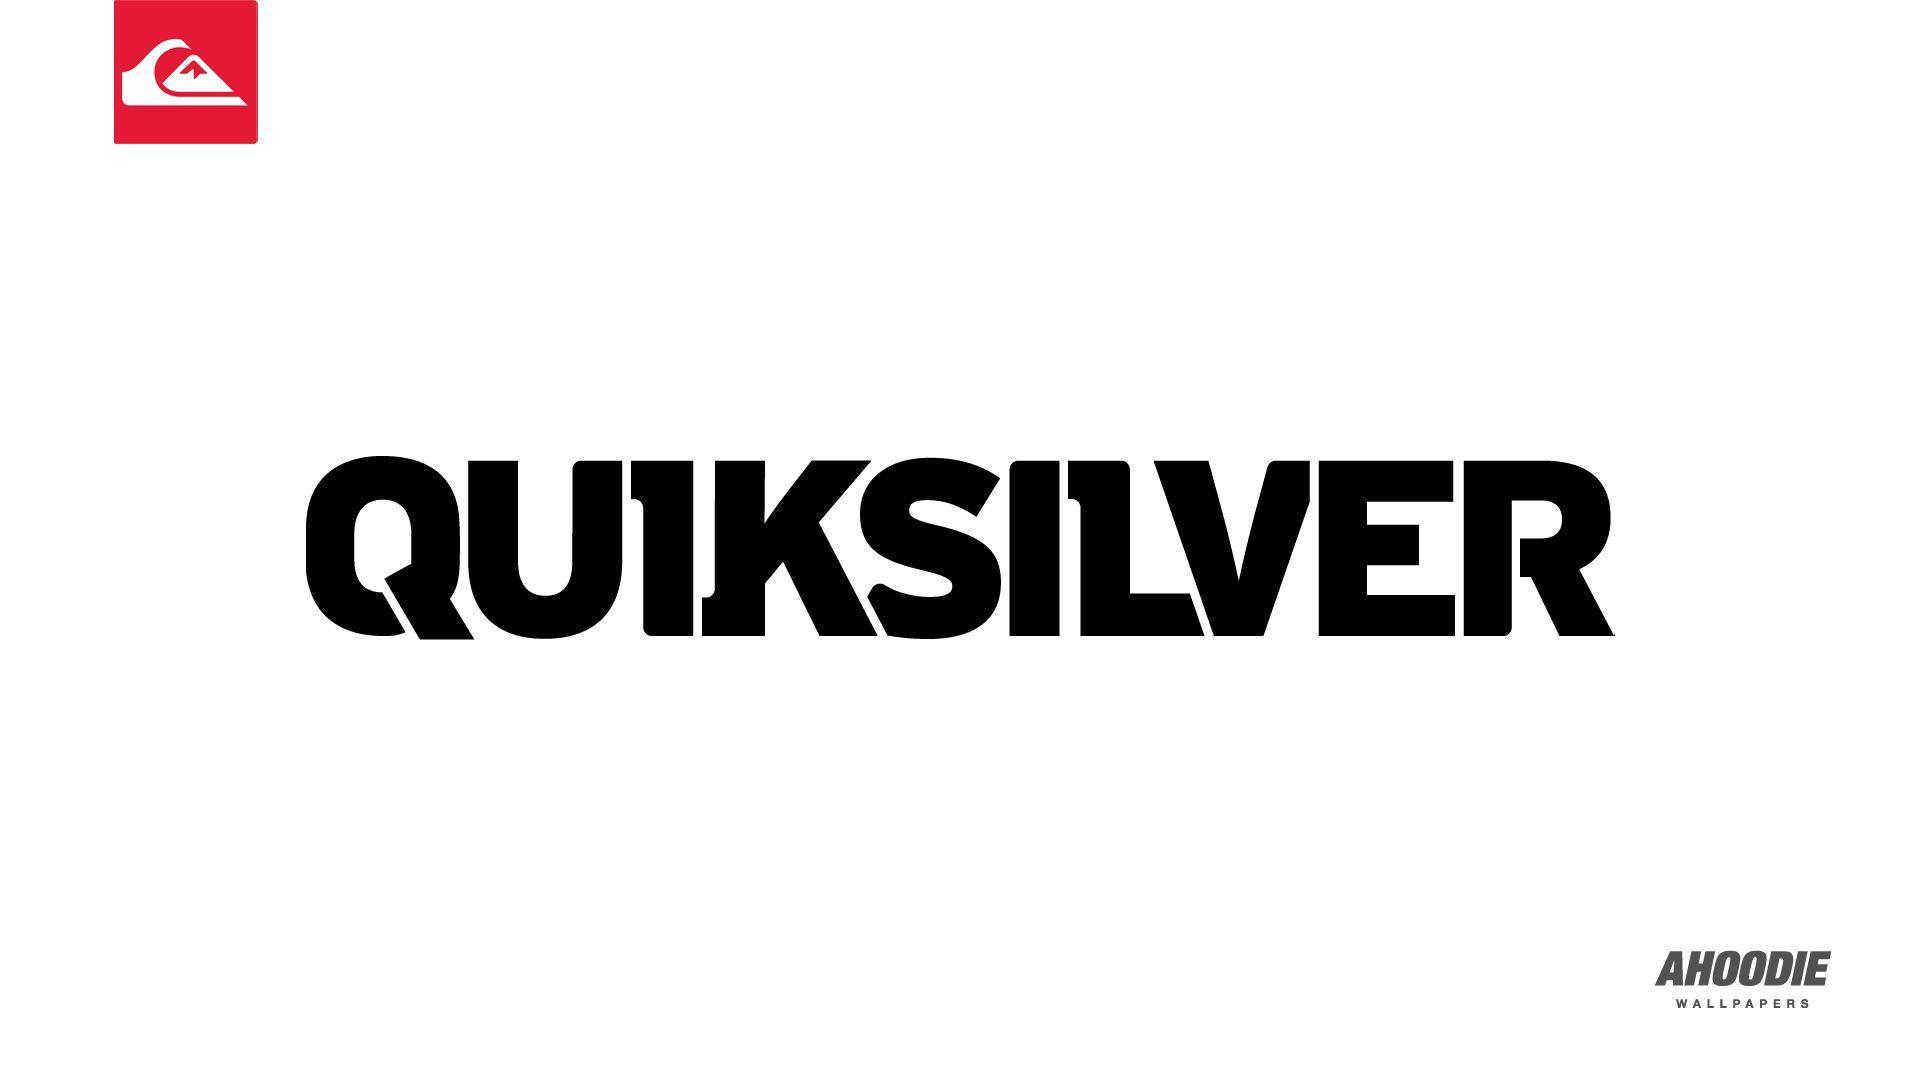 Quiksilver Logo Black - photogram